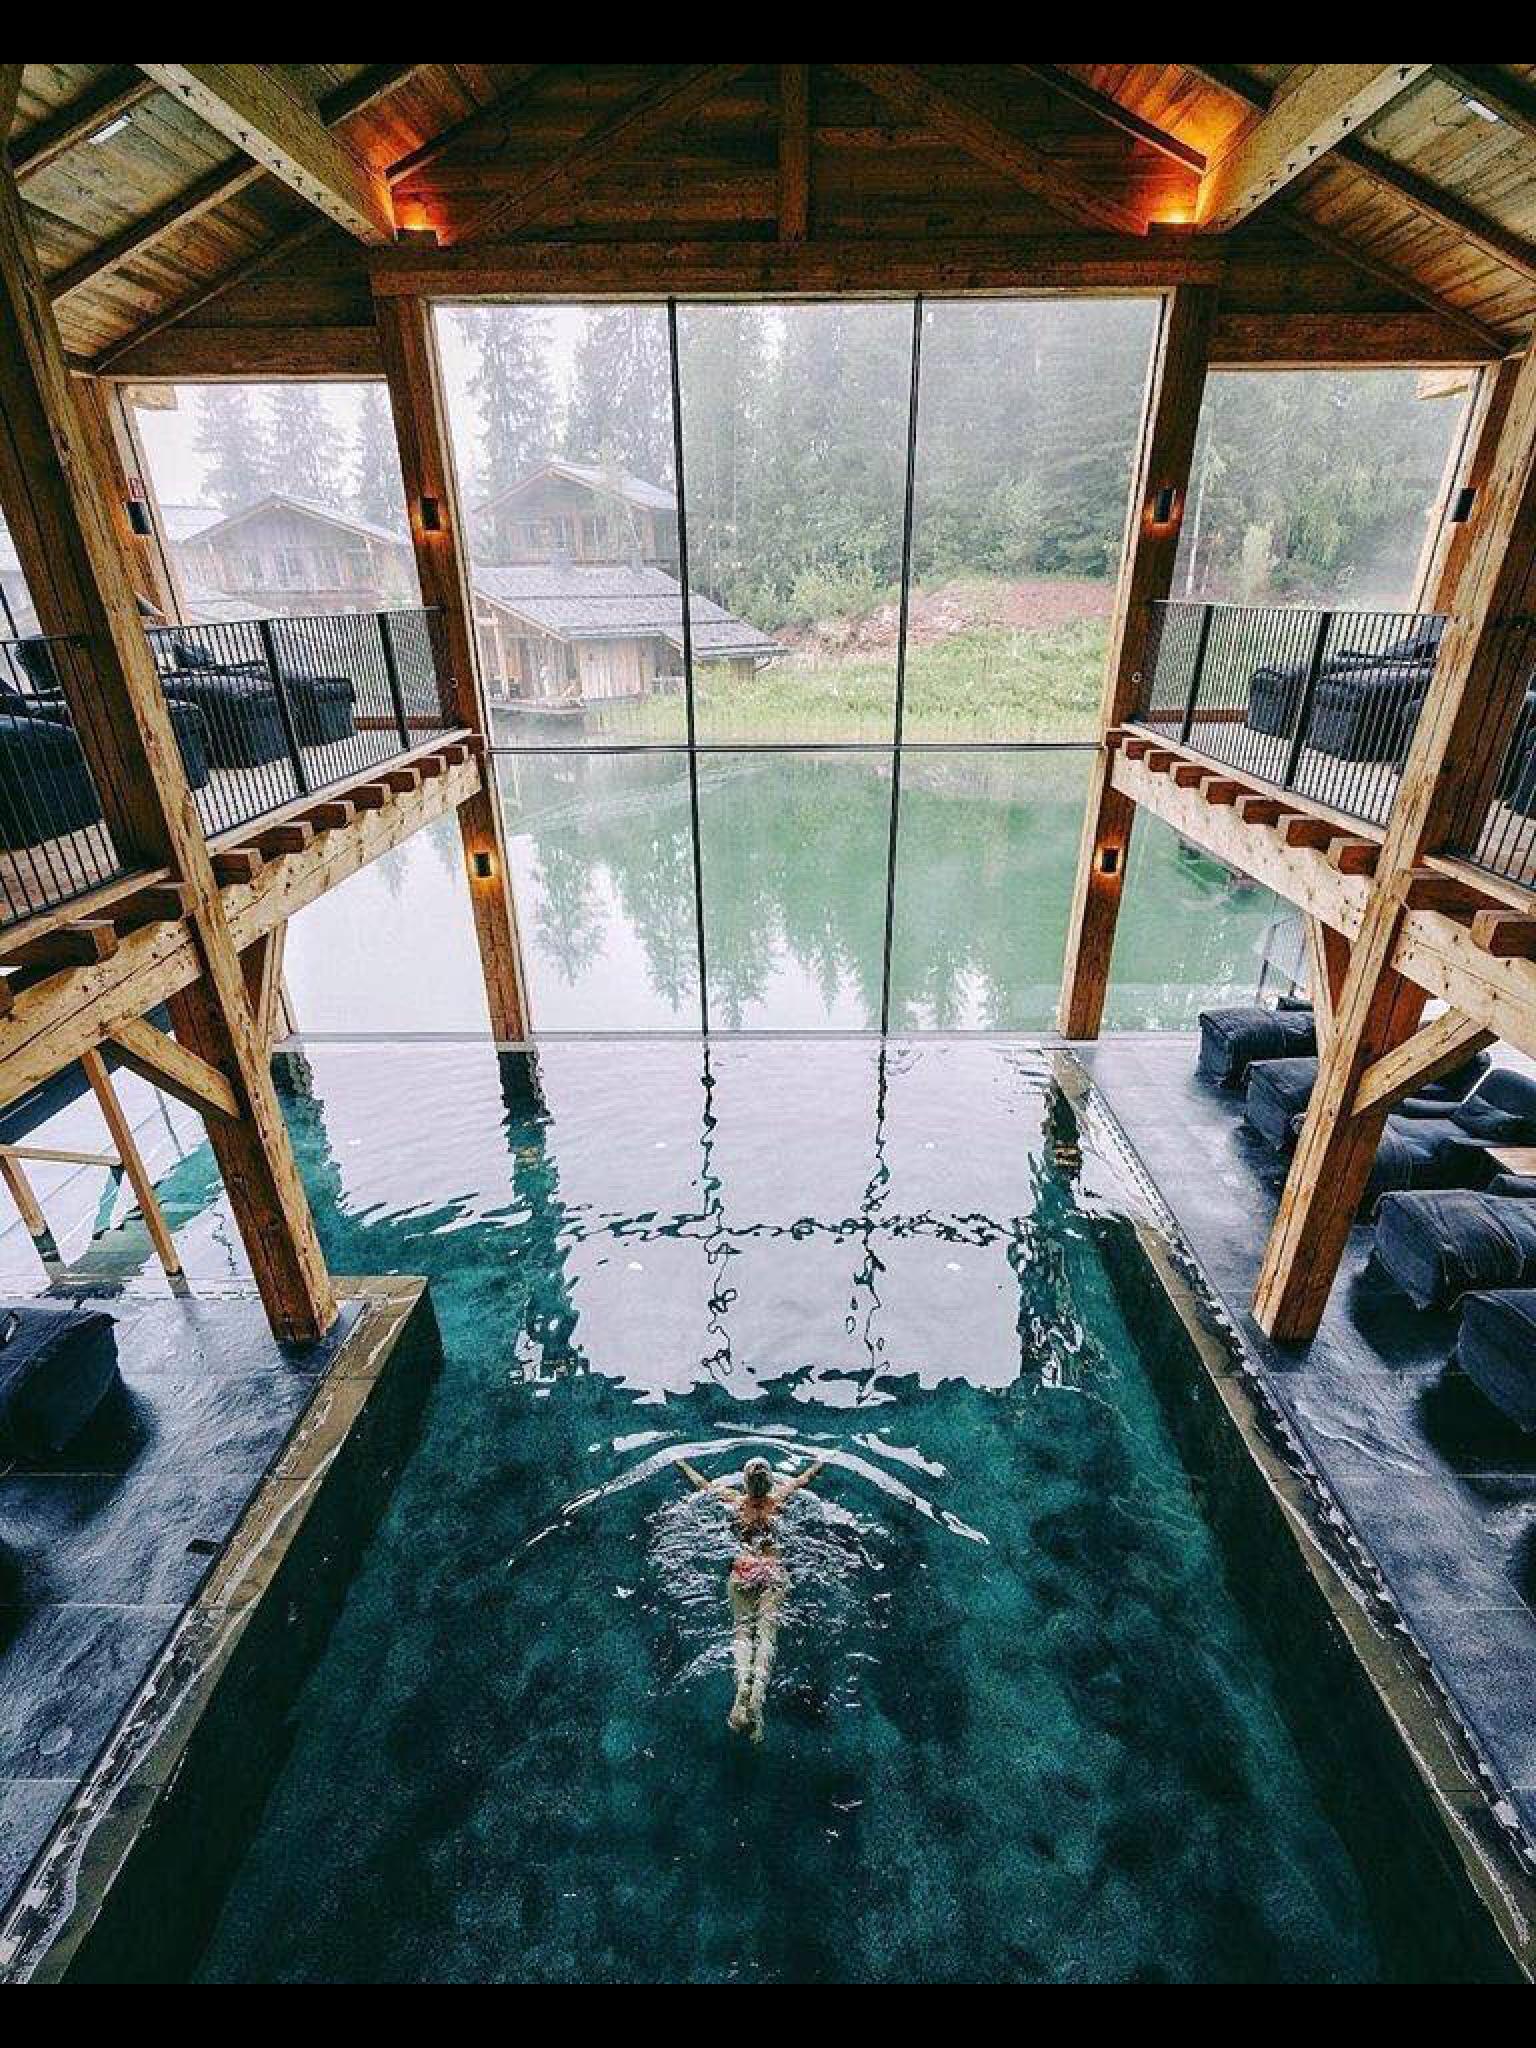 Beautiful Indoor Swimming Pool Design Ideas For Your Home Indoorswimmingpool Swimmingpoo Indoor Swimming Pool Design Indoor Pool Design Indoor Swimming Pools